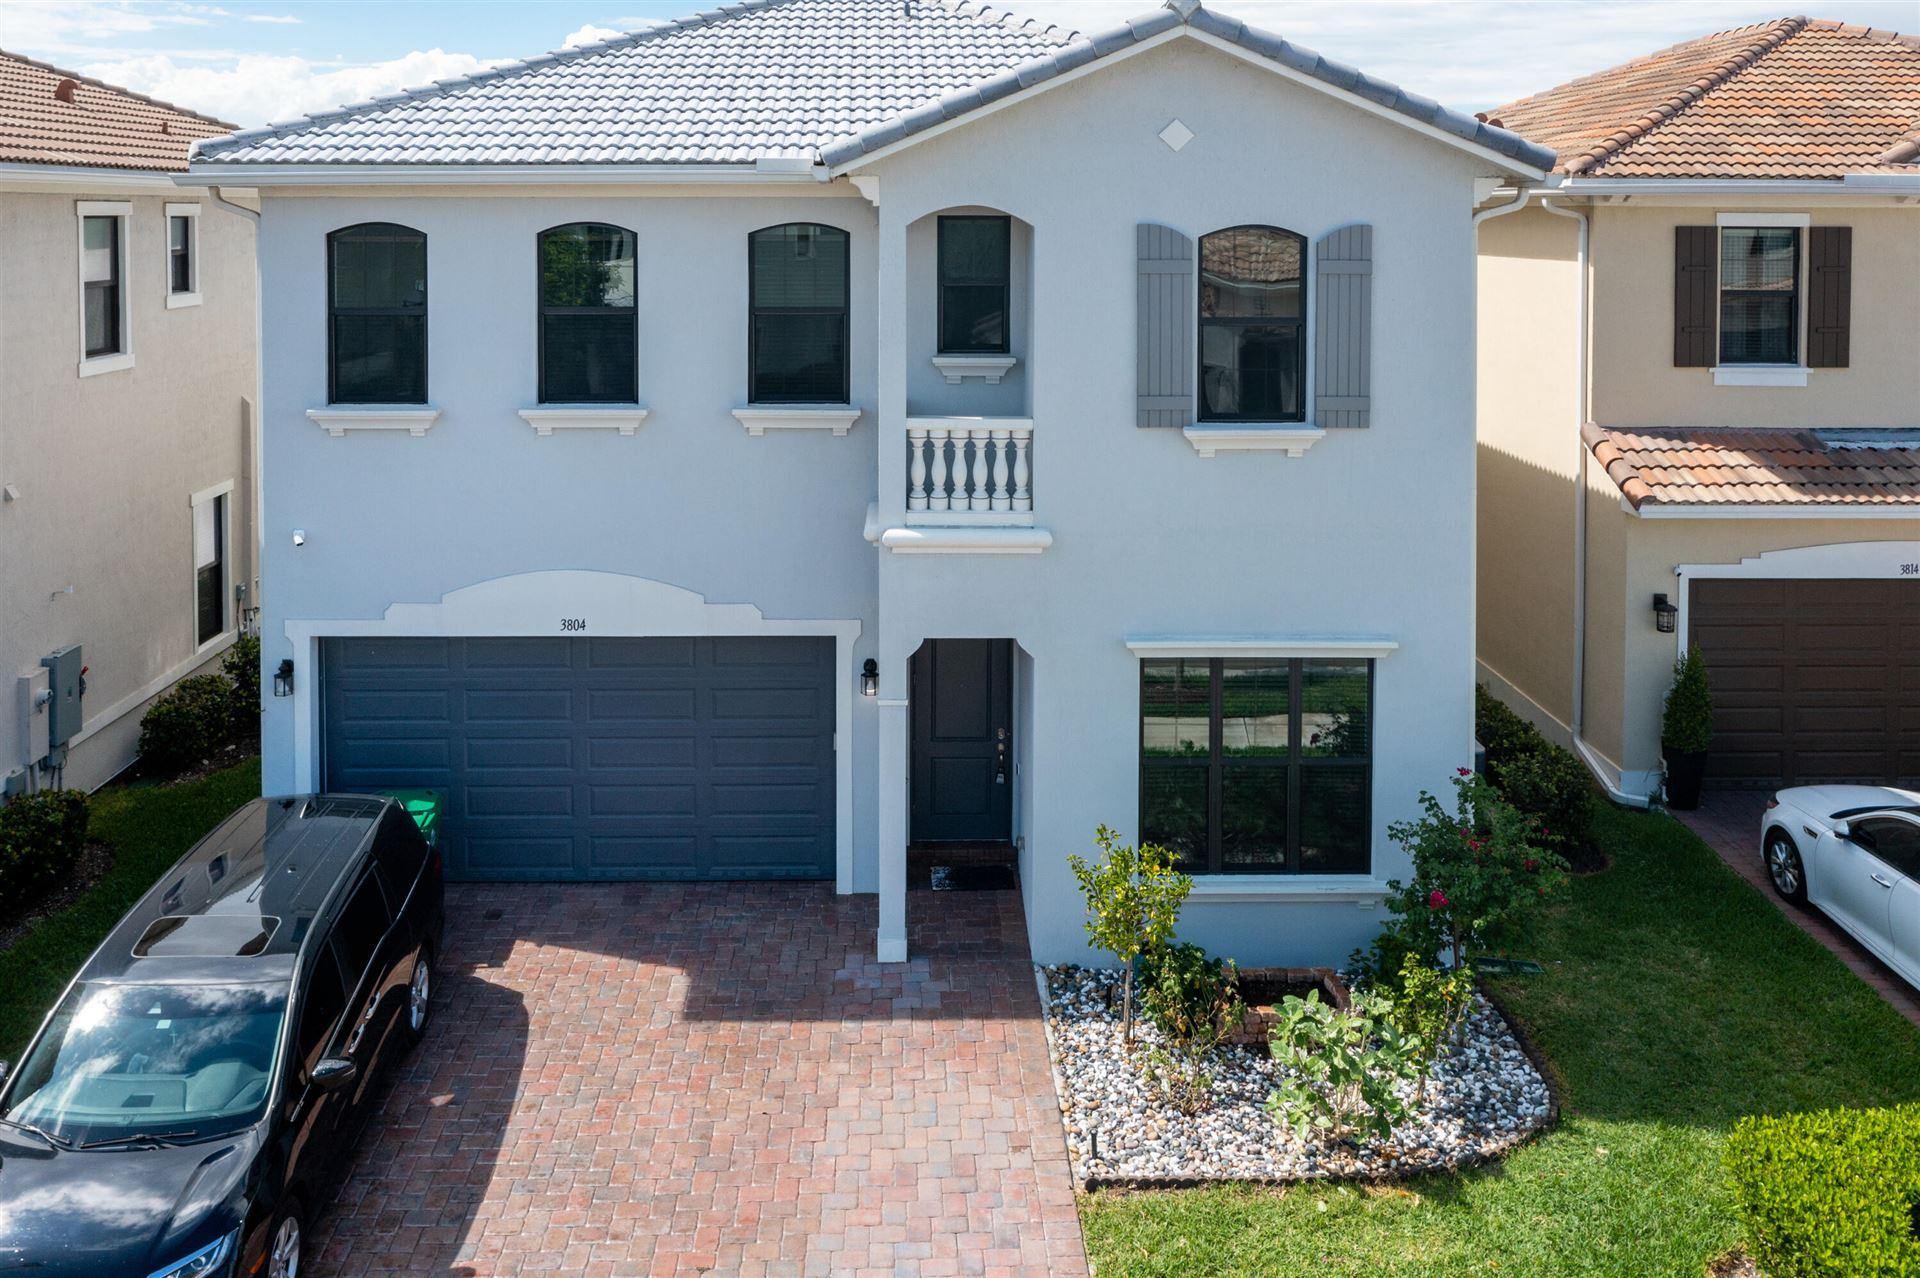 3804 NW 89th Way, Coral Springs, FL 33065 - MLS#: RX-10752219